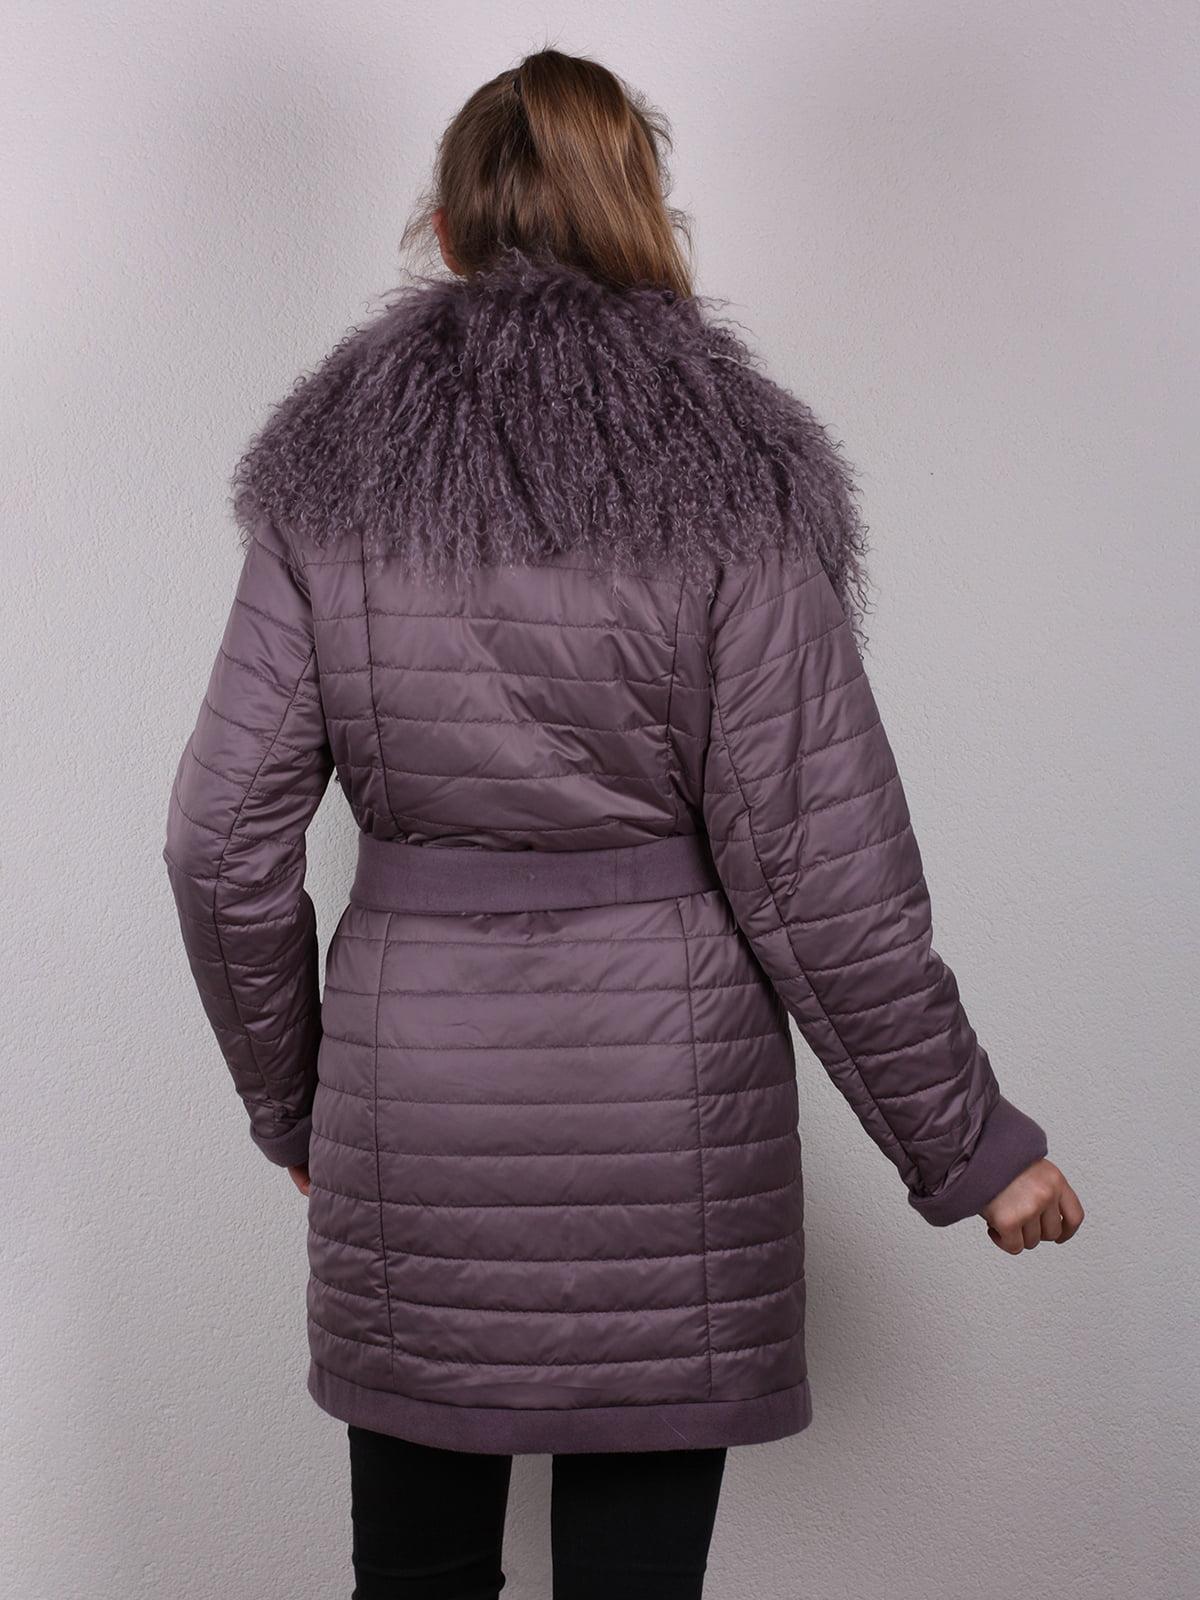 Пальто сиреневое | 4770662 | фото 12